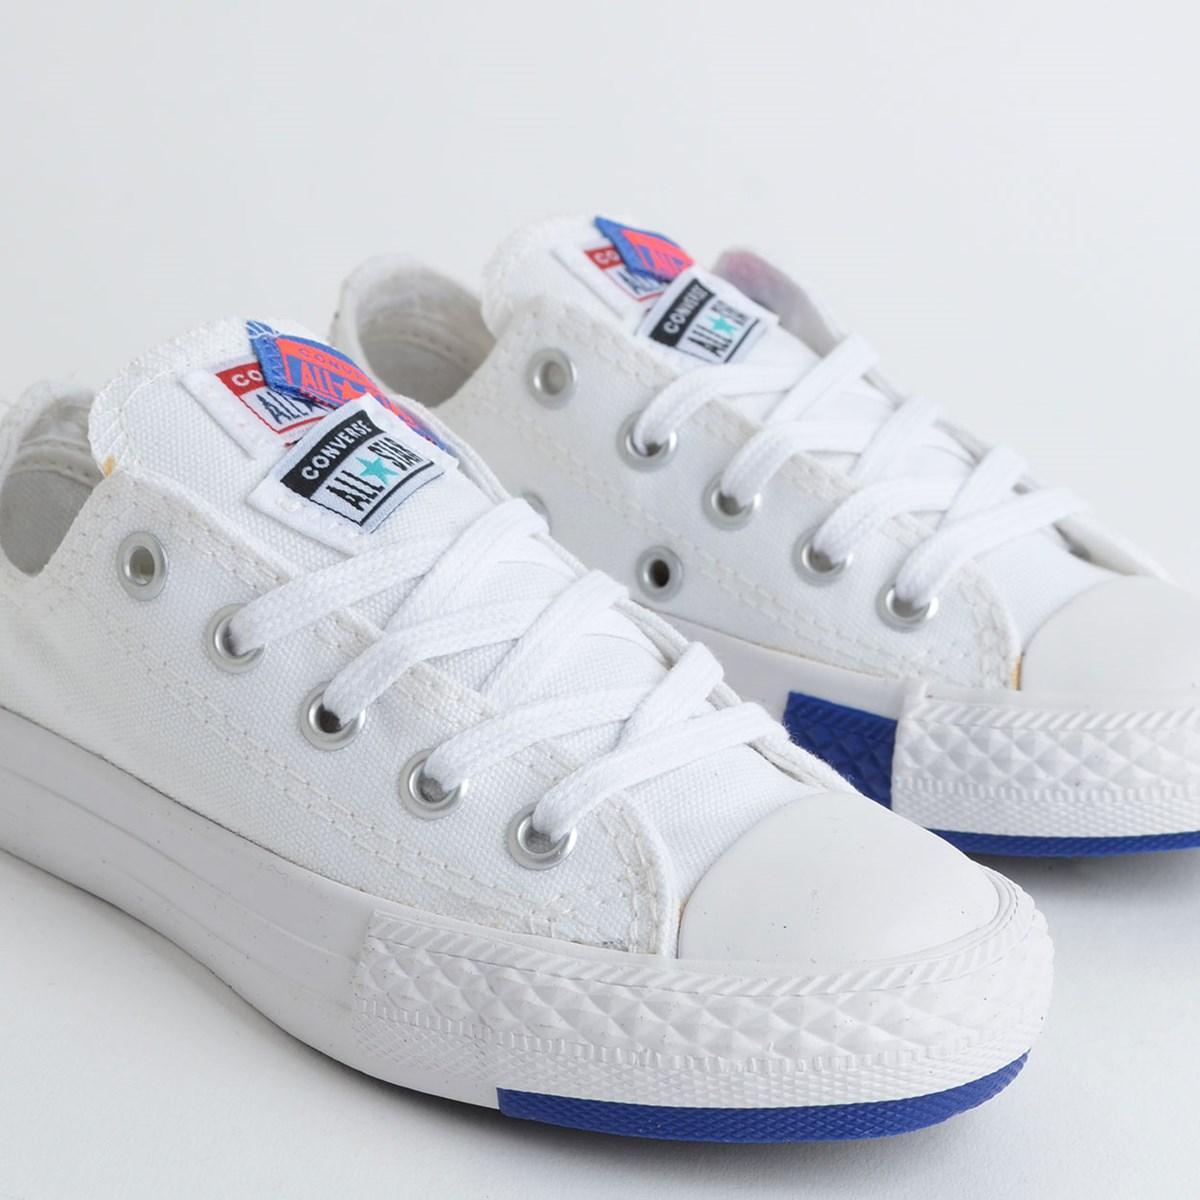 Tênis Converse Chuck Taylor All Star Logo Play Kids Ox Branco Azul CK08190002